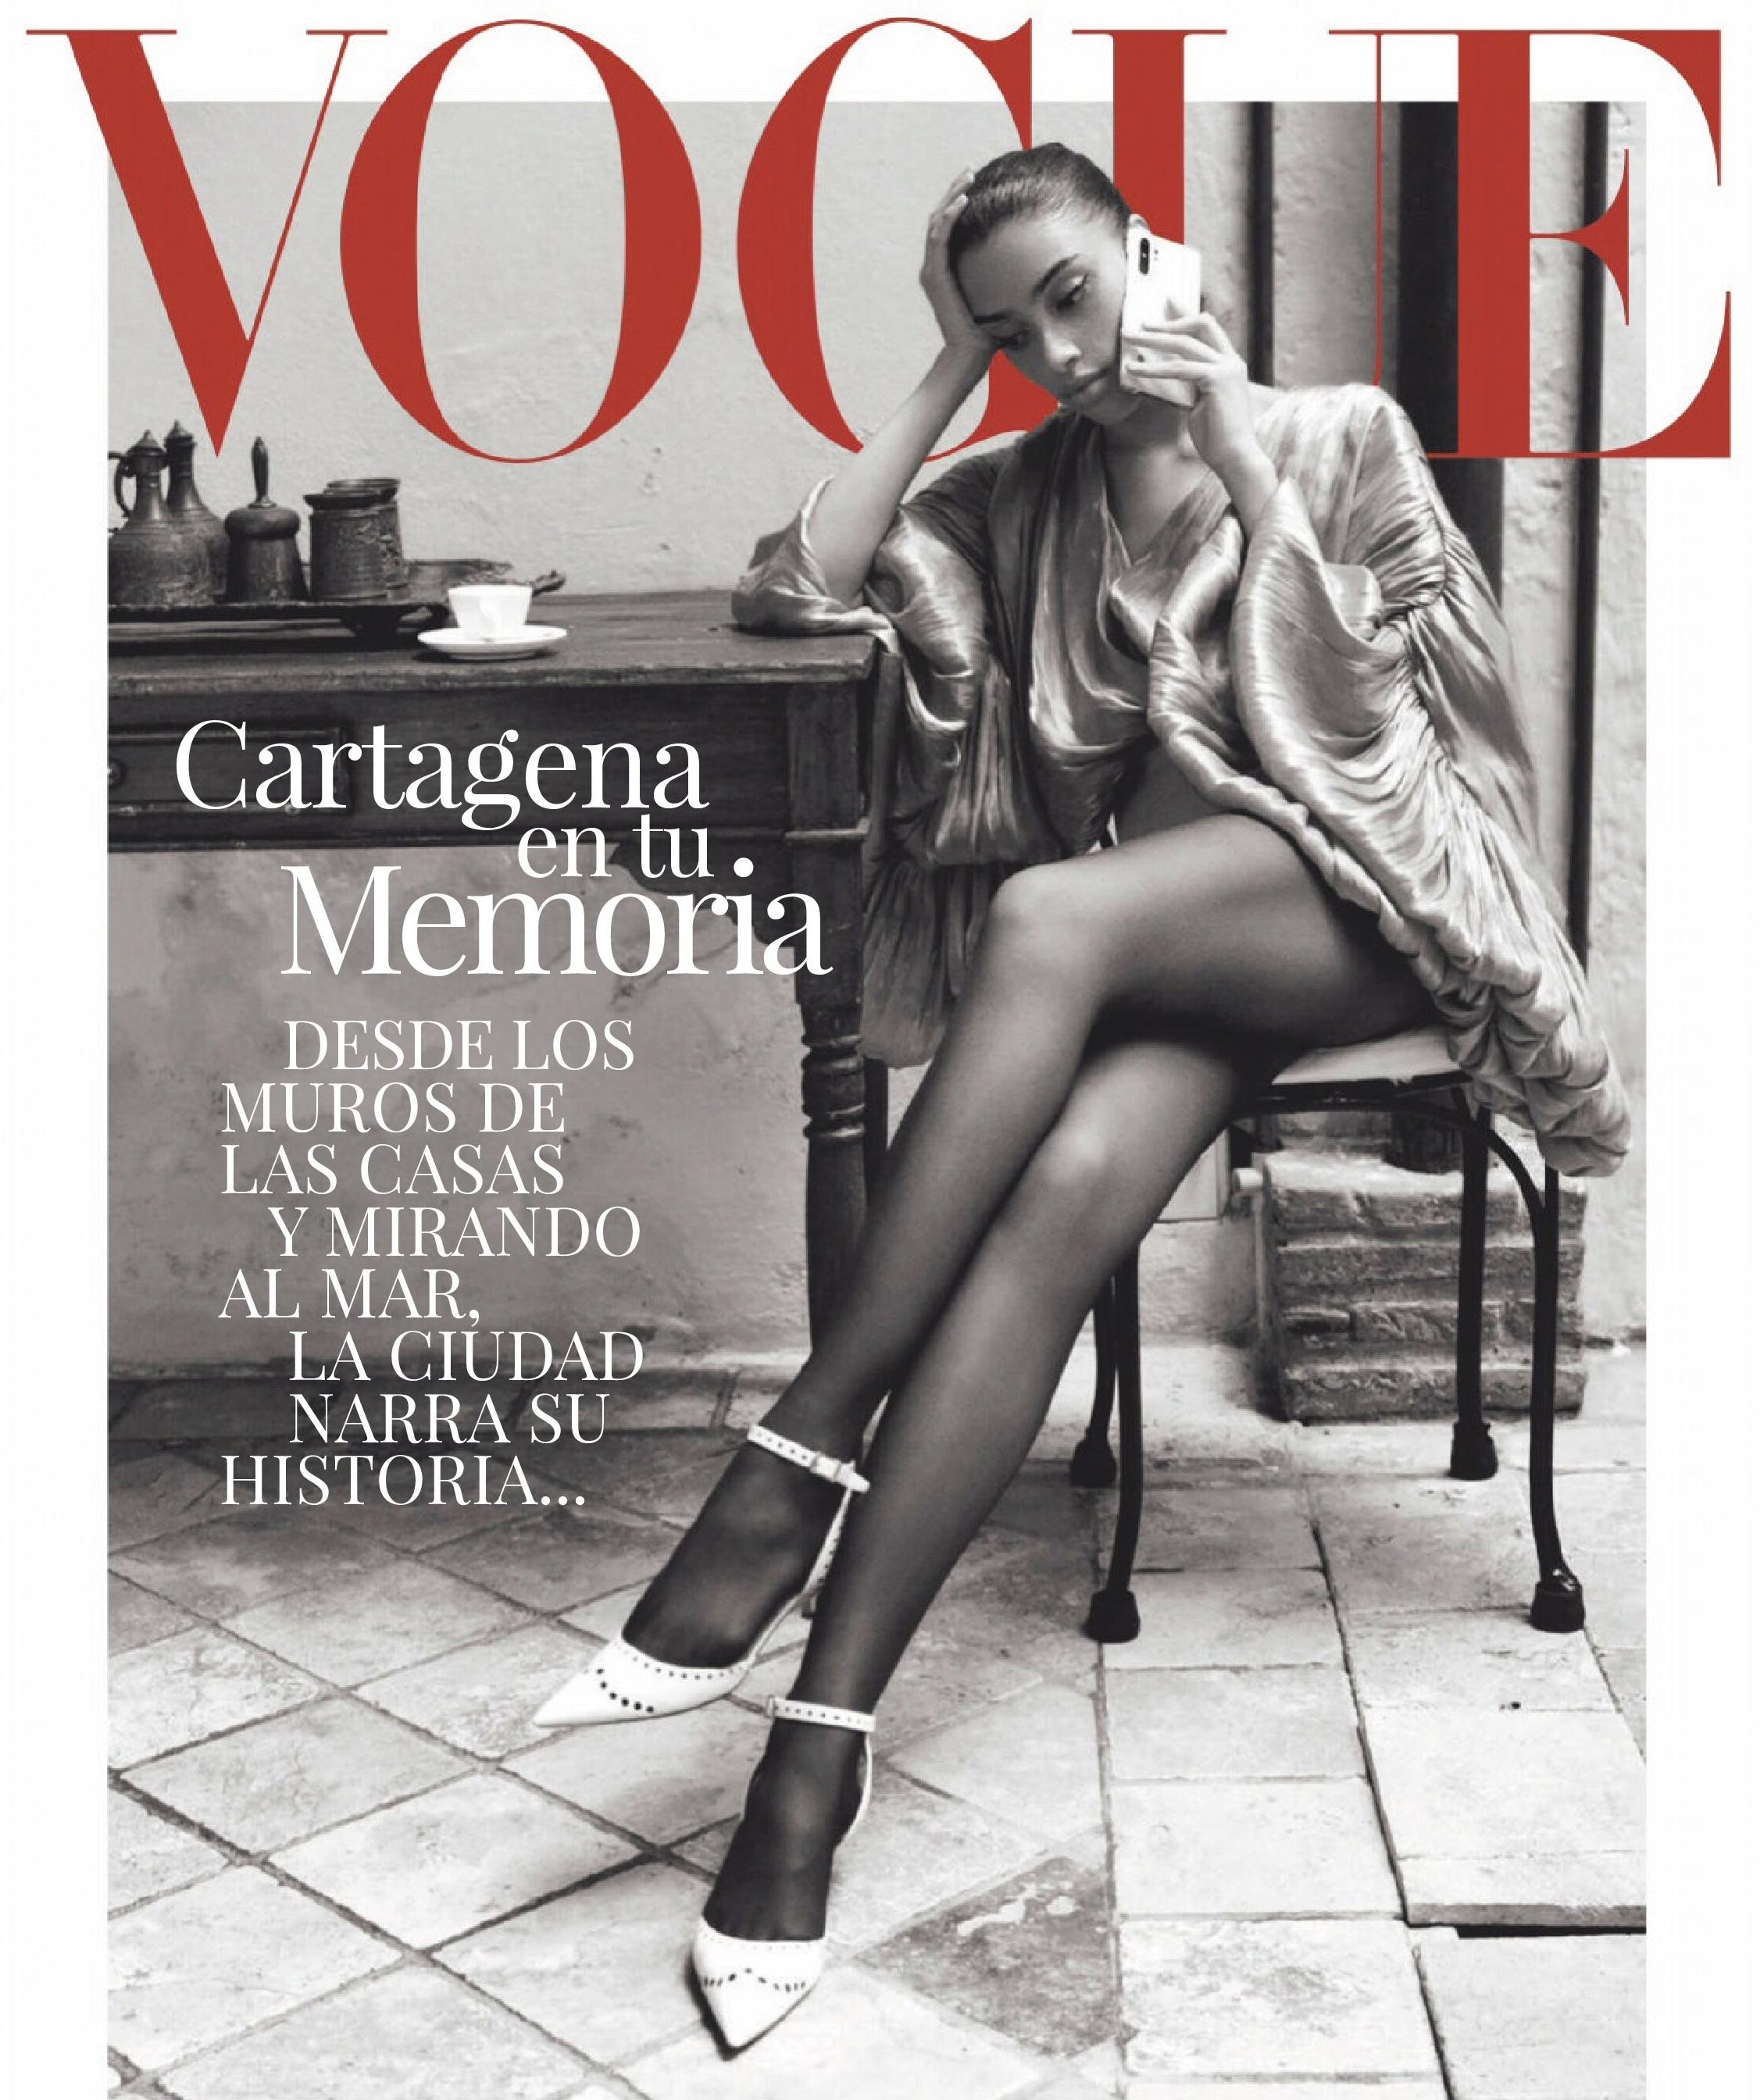 Khadija-Red-Thunder-Bjorn-Iooss-Vogue-Latin-America-May-2019- (10).jpg